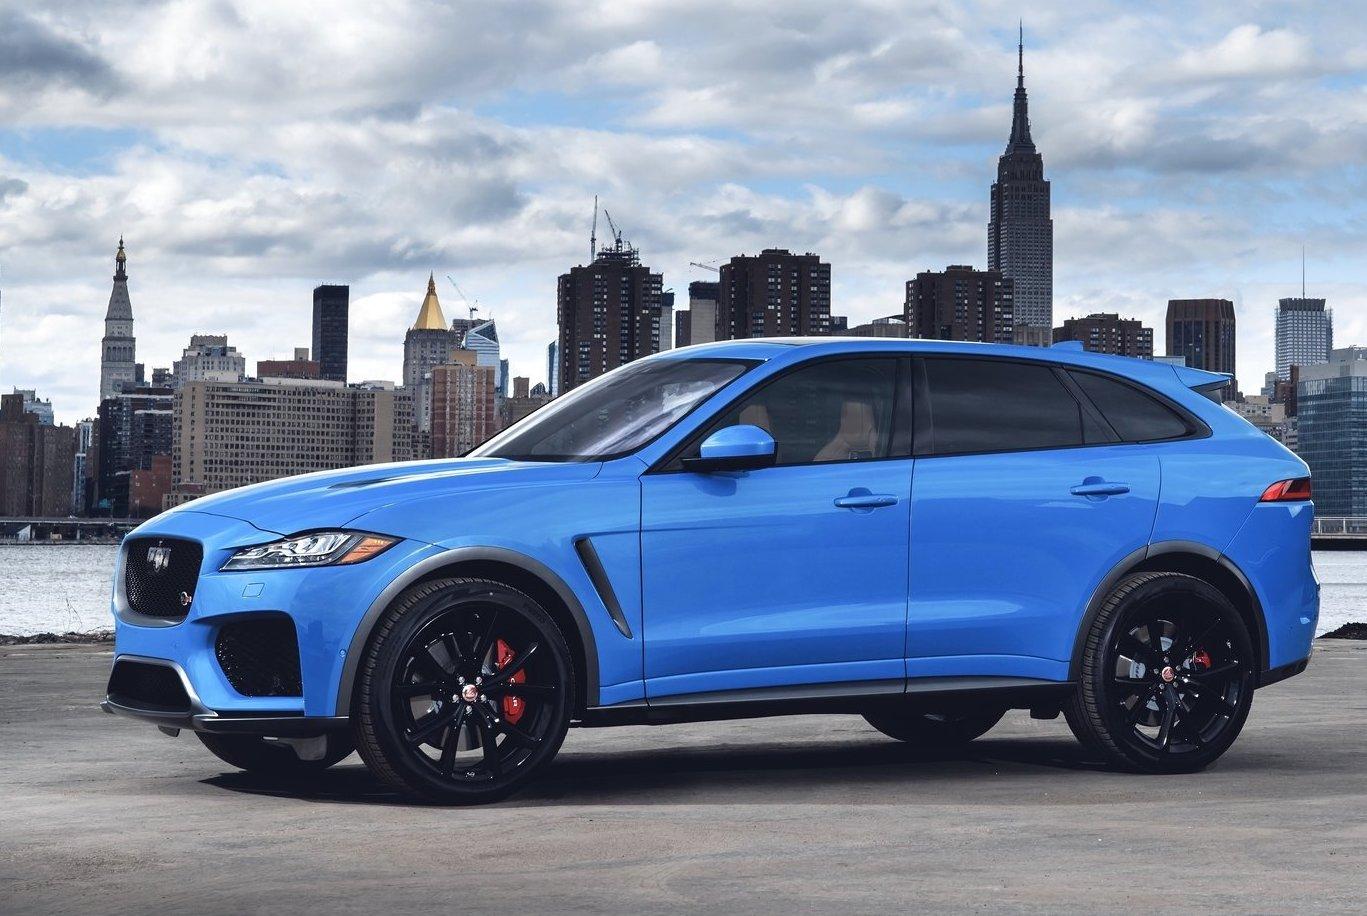 Jaguar F Pace Svr Confirmed For Australia Price Announced Driving